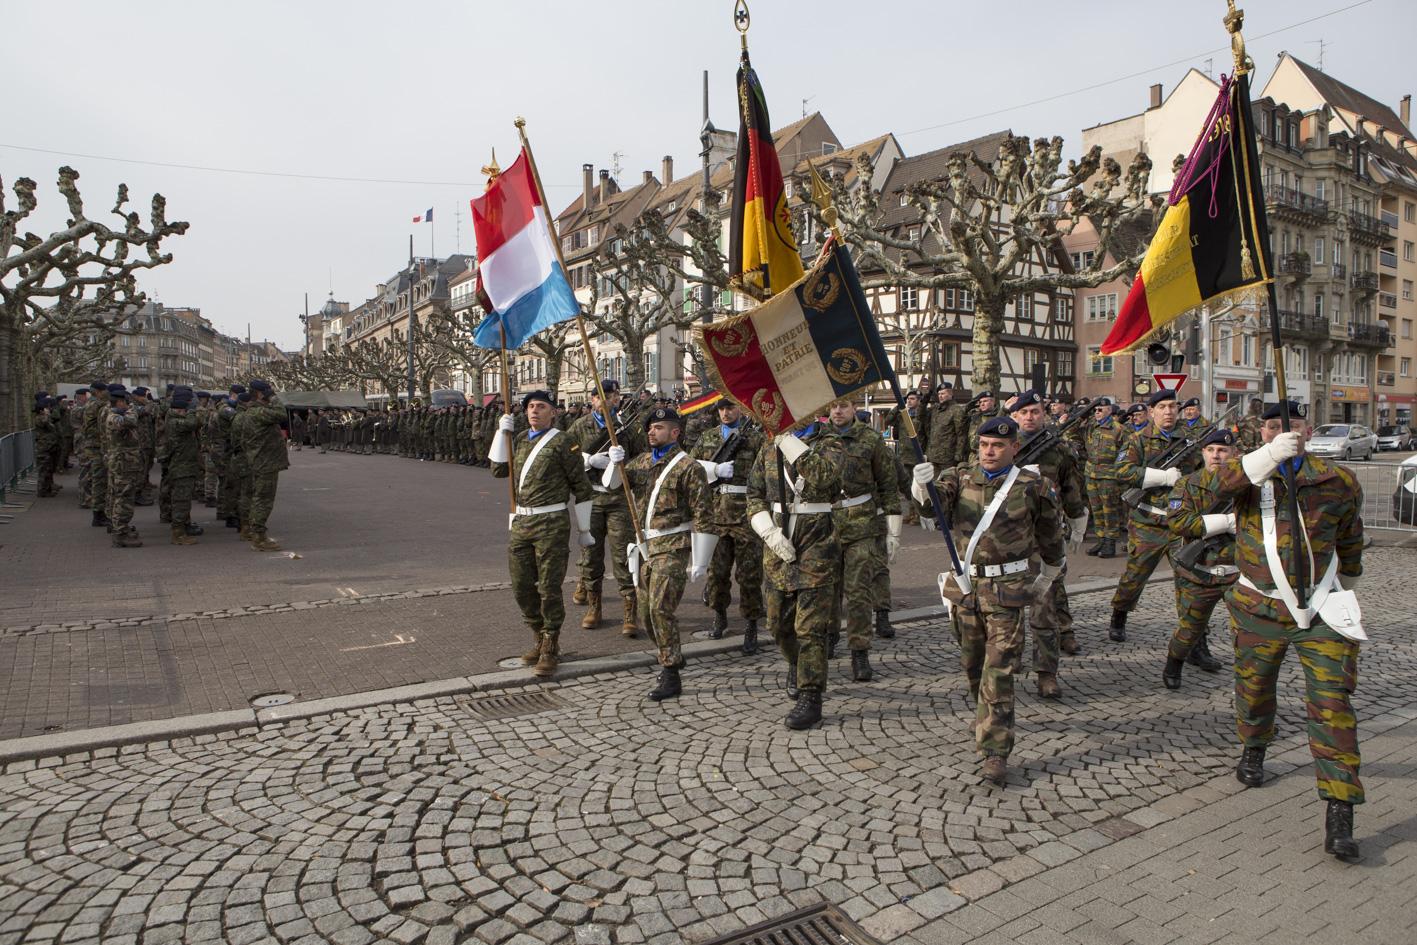 Wojska Polskiego се стреми към Еврокорпуса